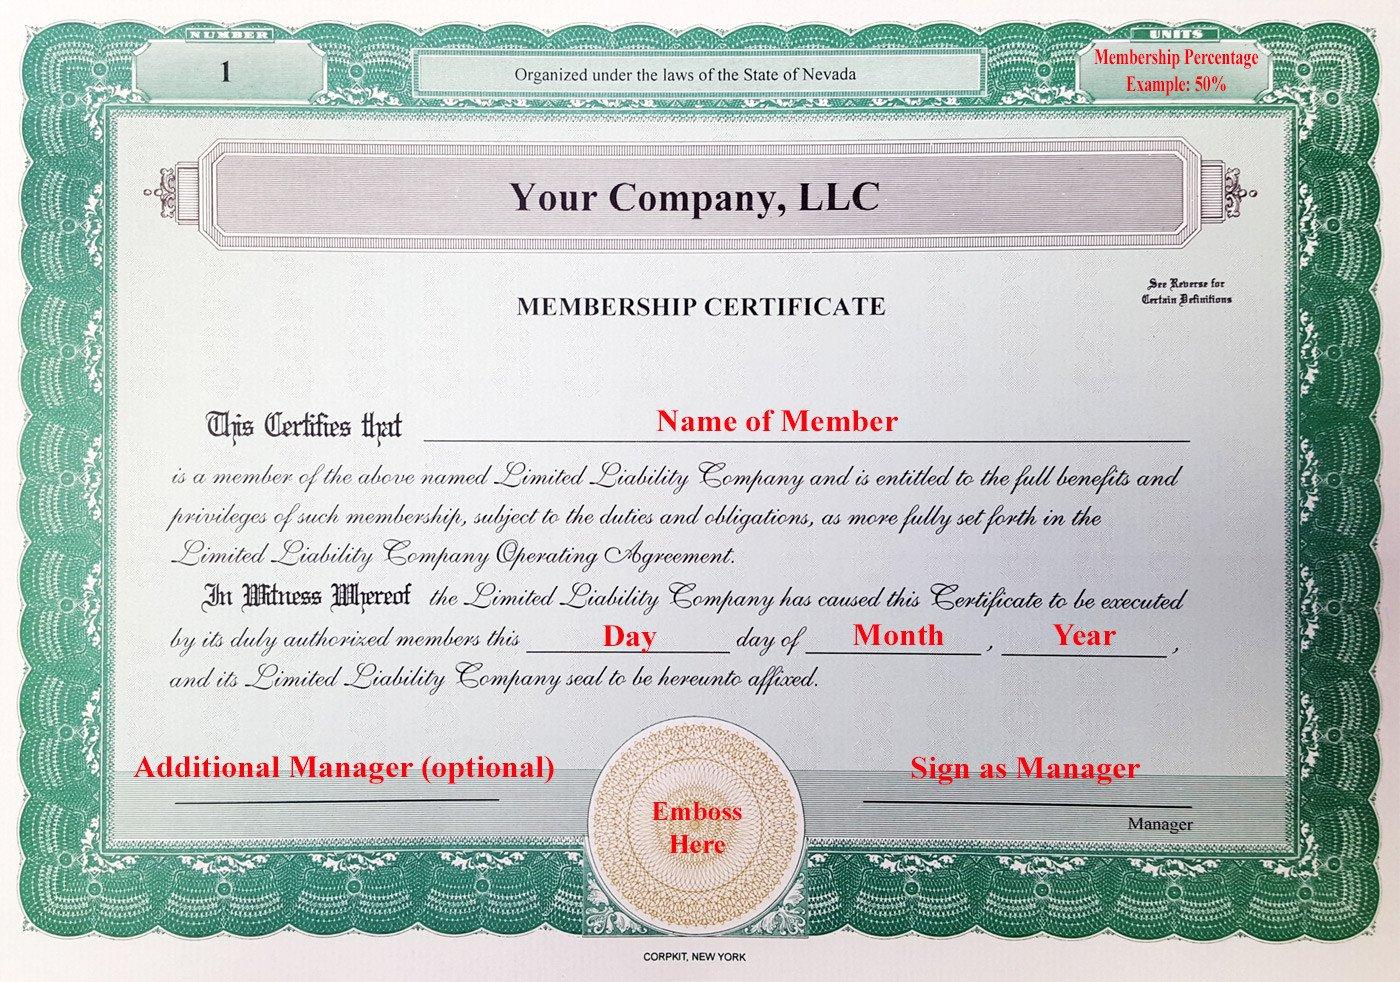 Llc Membership Certificate Template Laughlin associates Inc